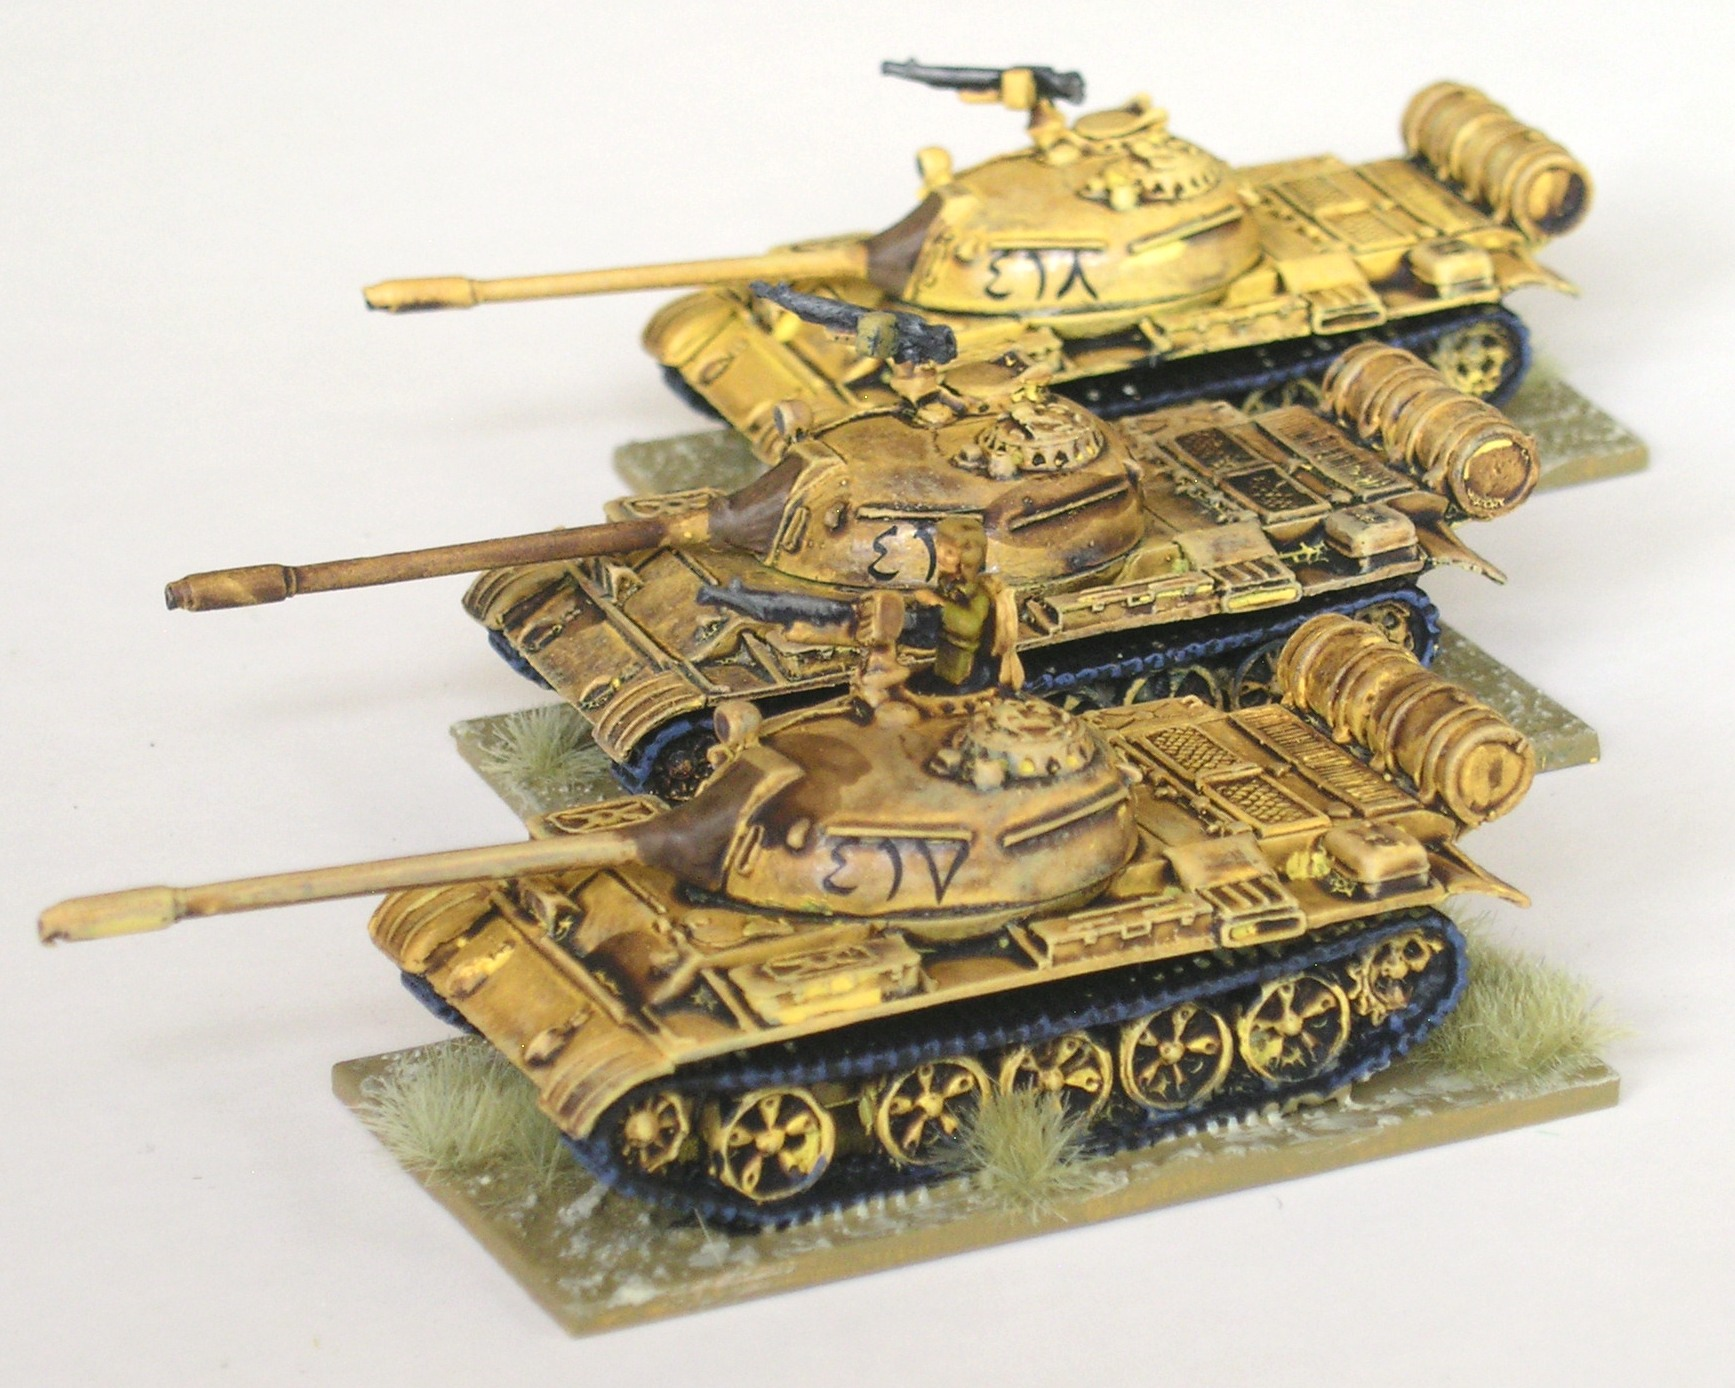 2nd Platoon: 3 x T-55